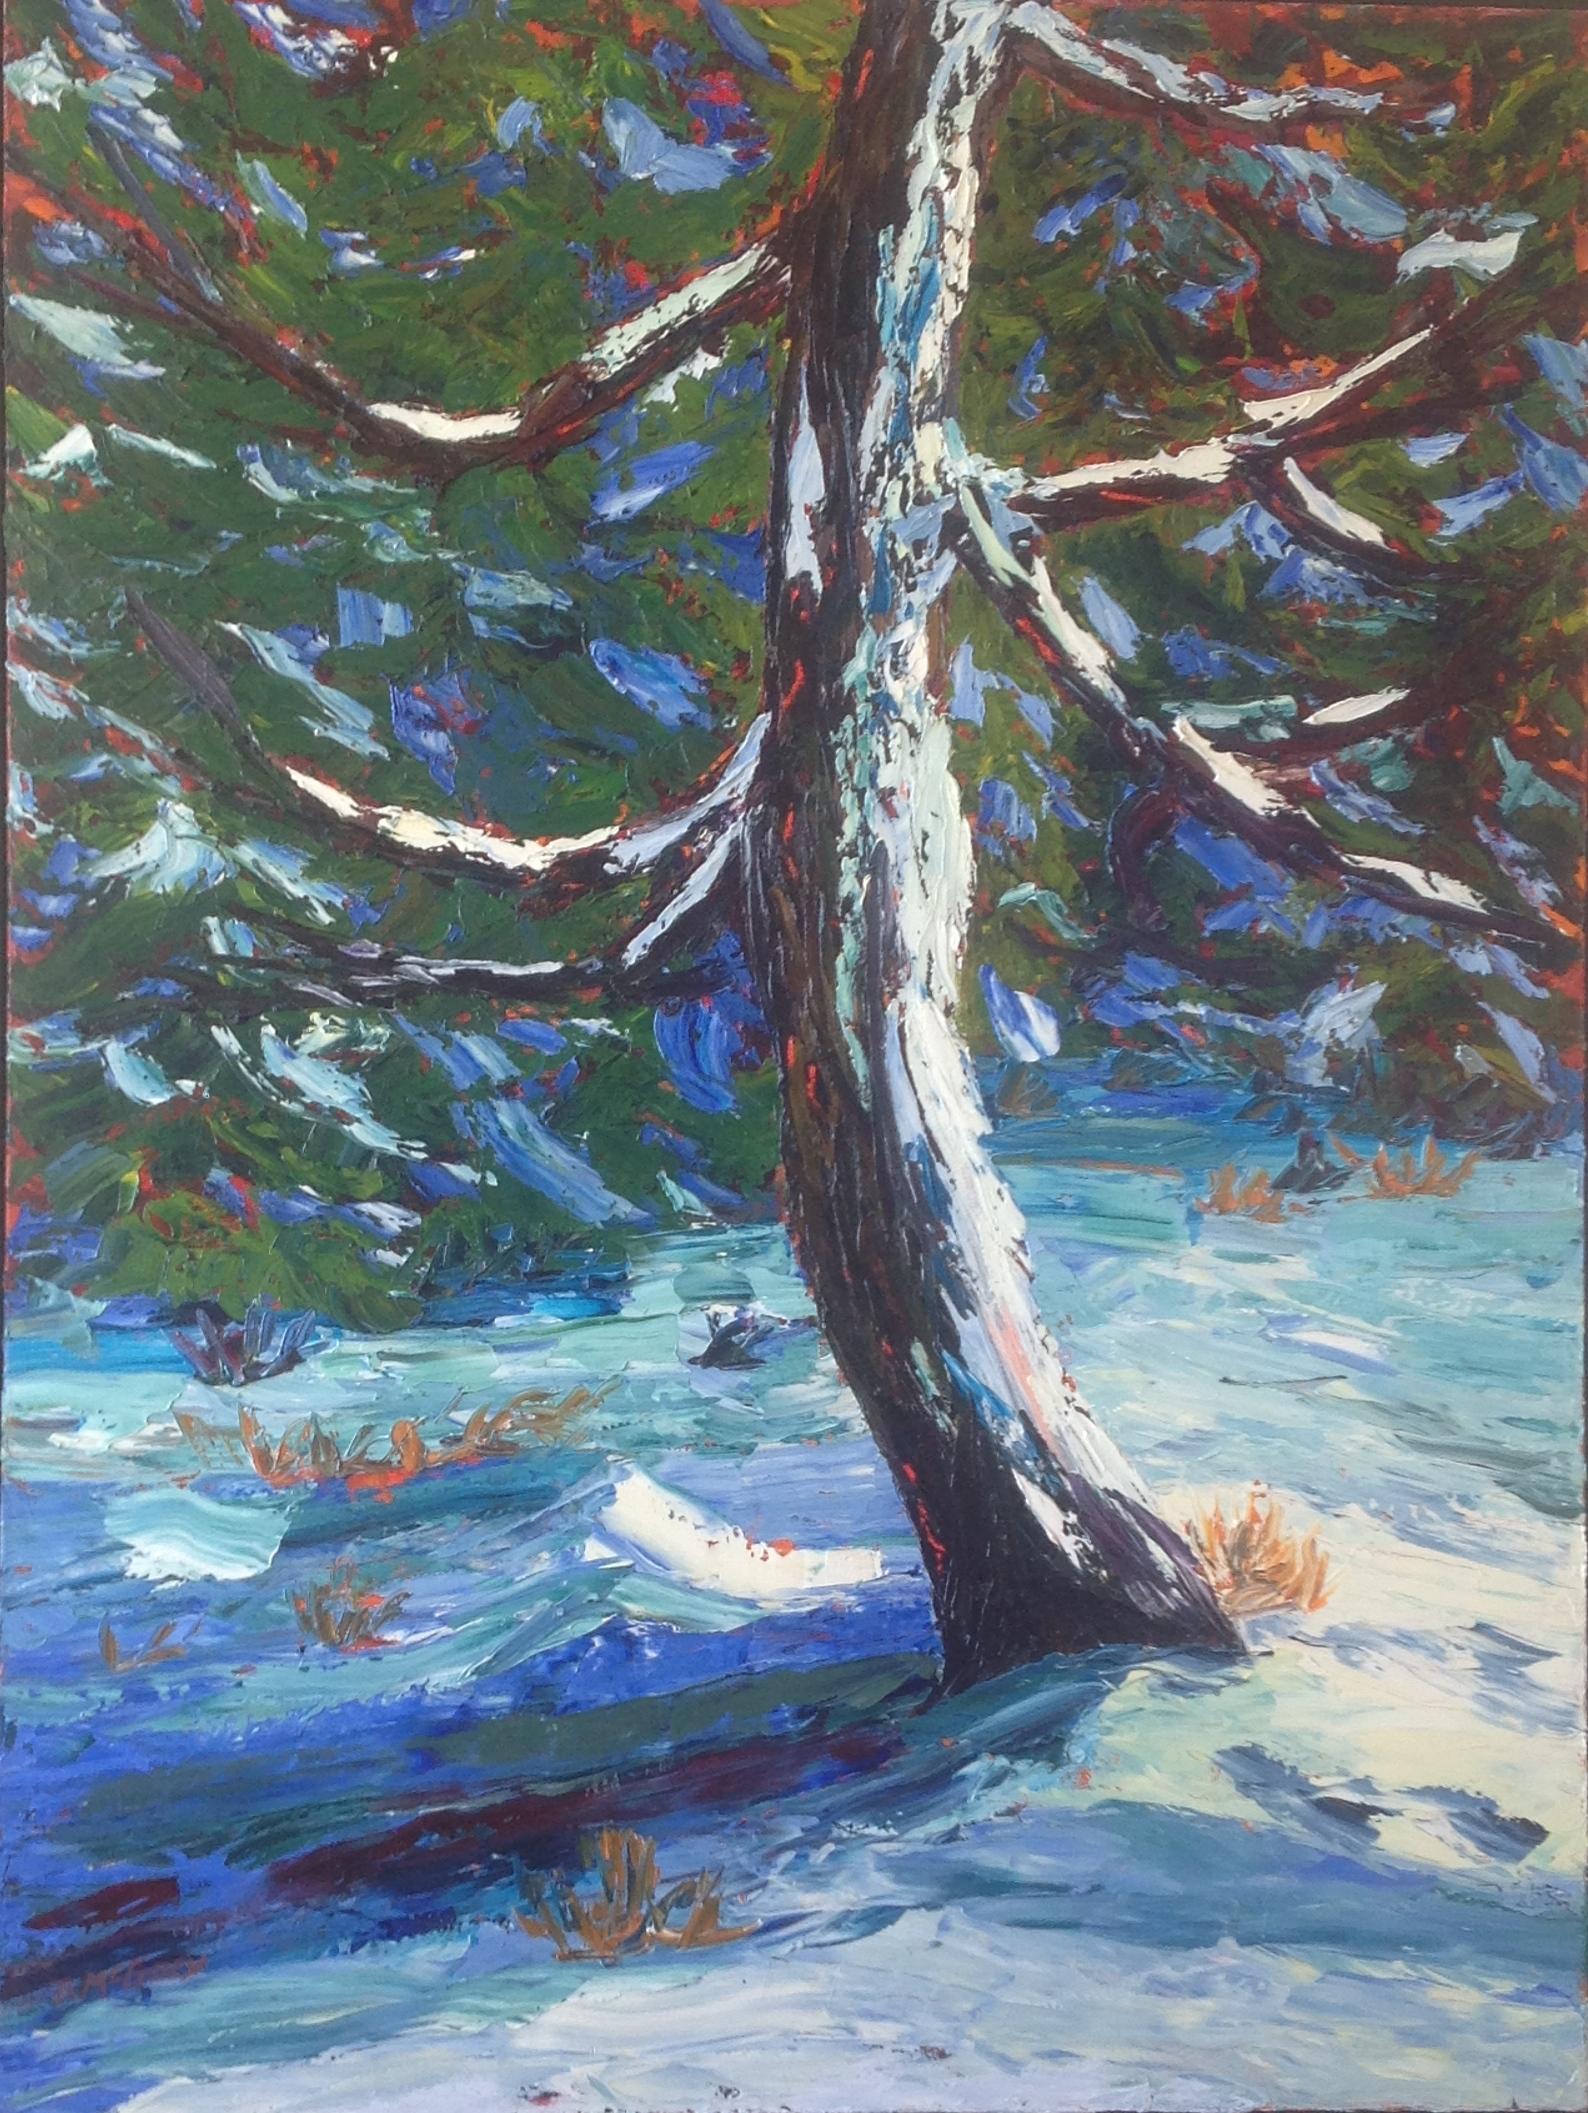 Winter Portrait, 48 X 36, Oil on Canvas